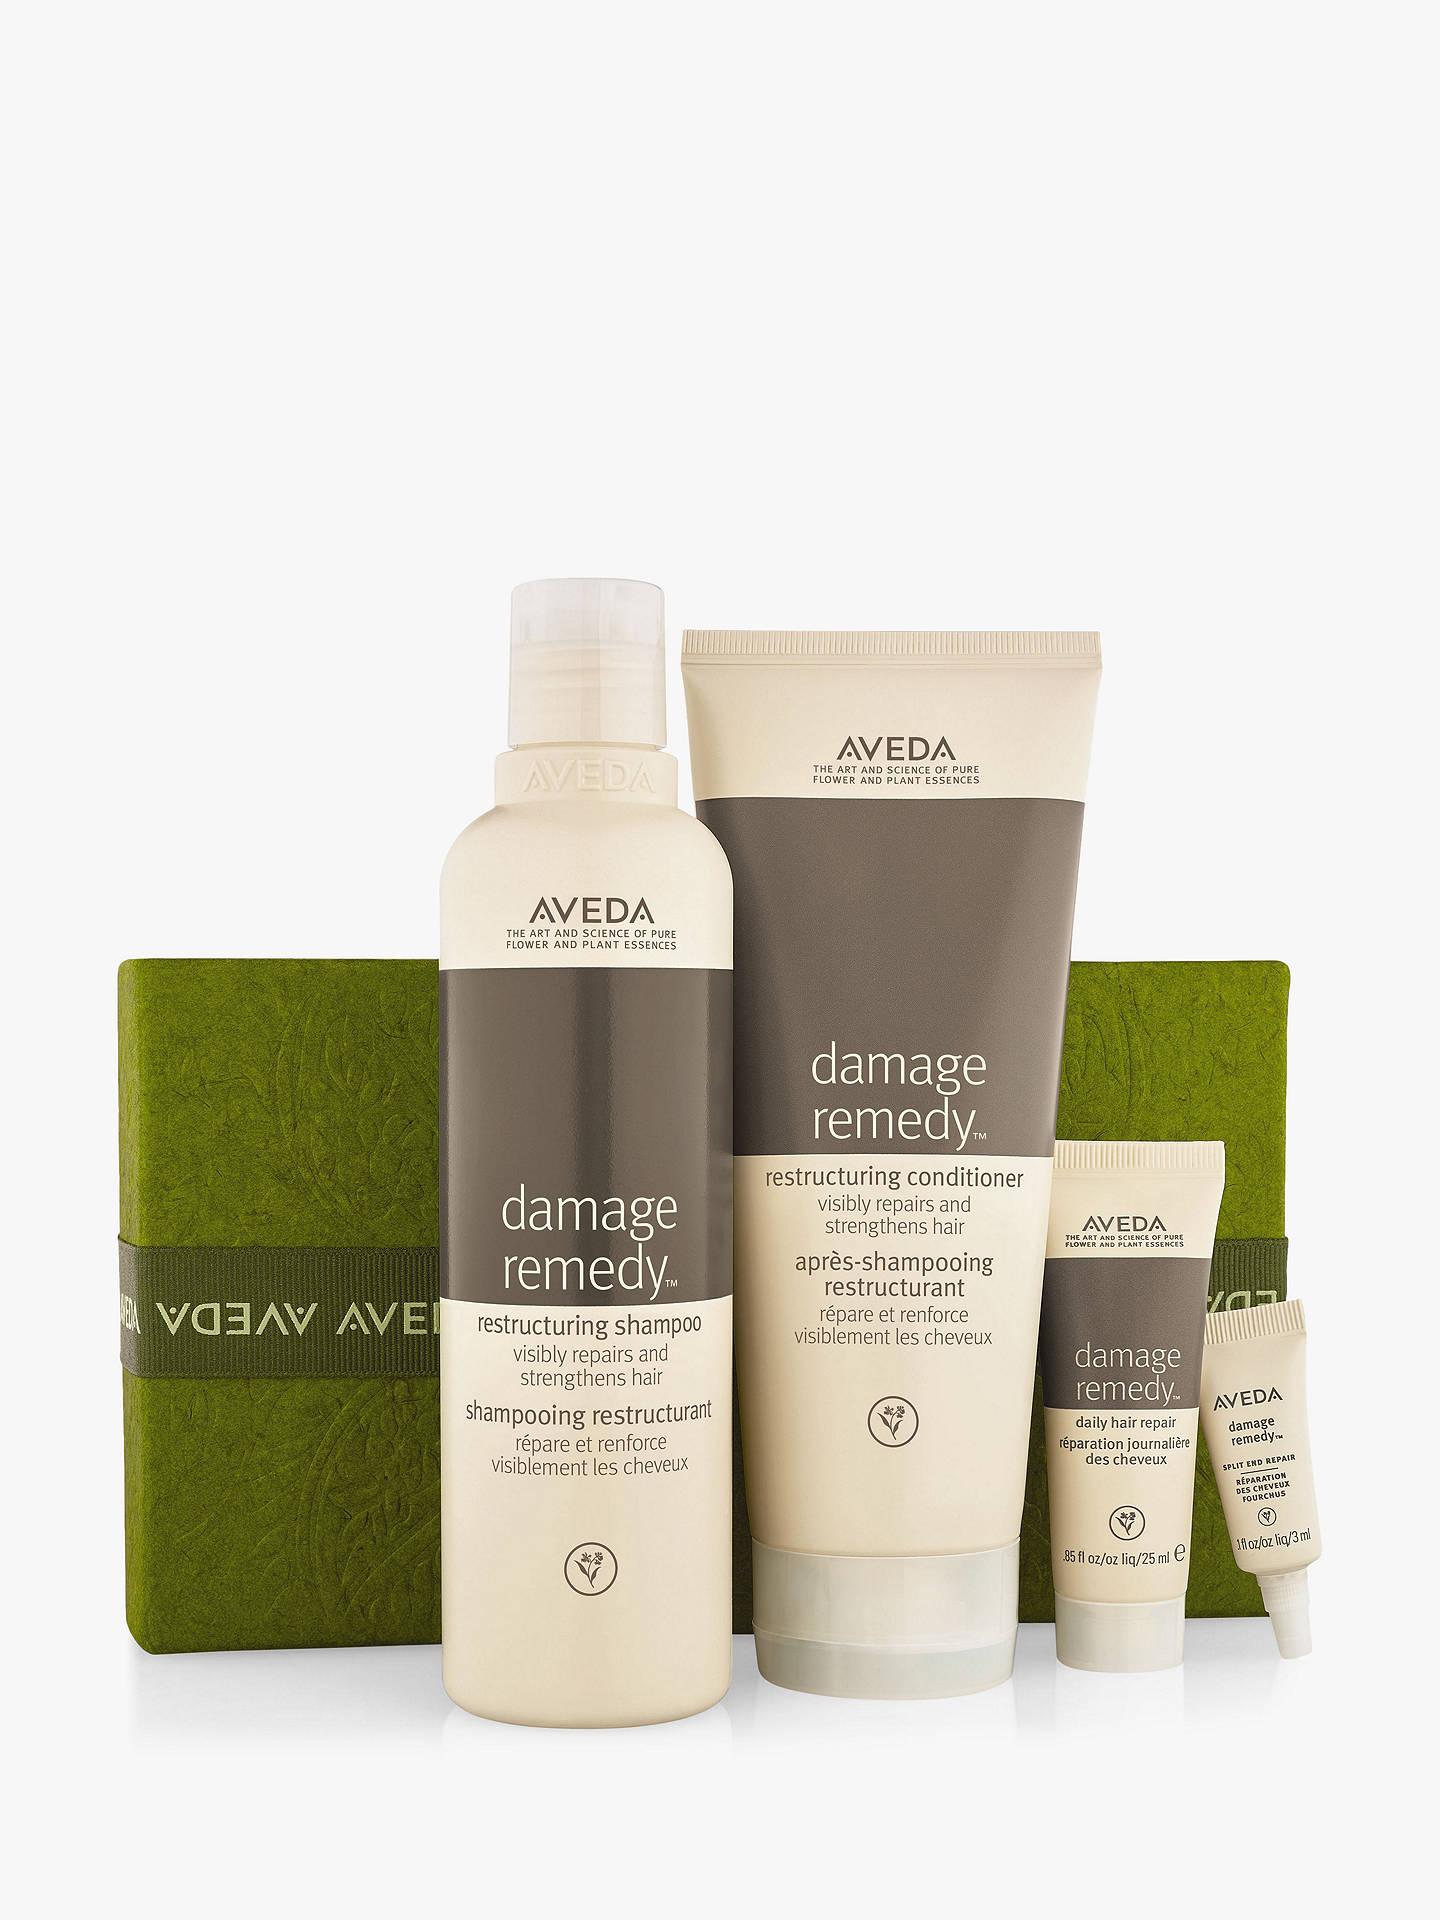 AVEDA Damage Remedy Haircare Gift Set